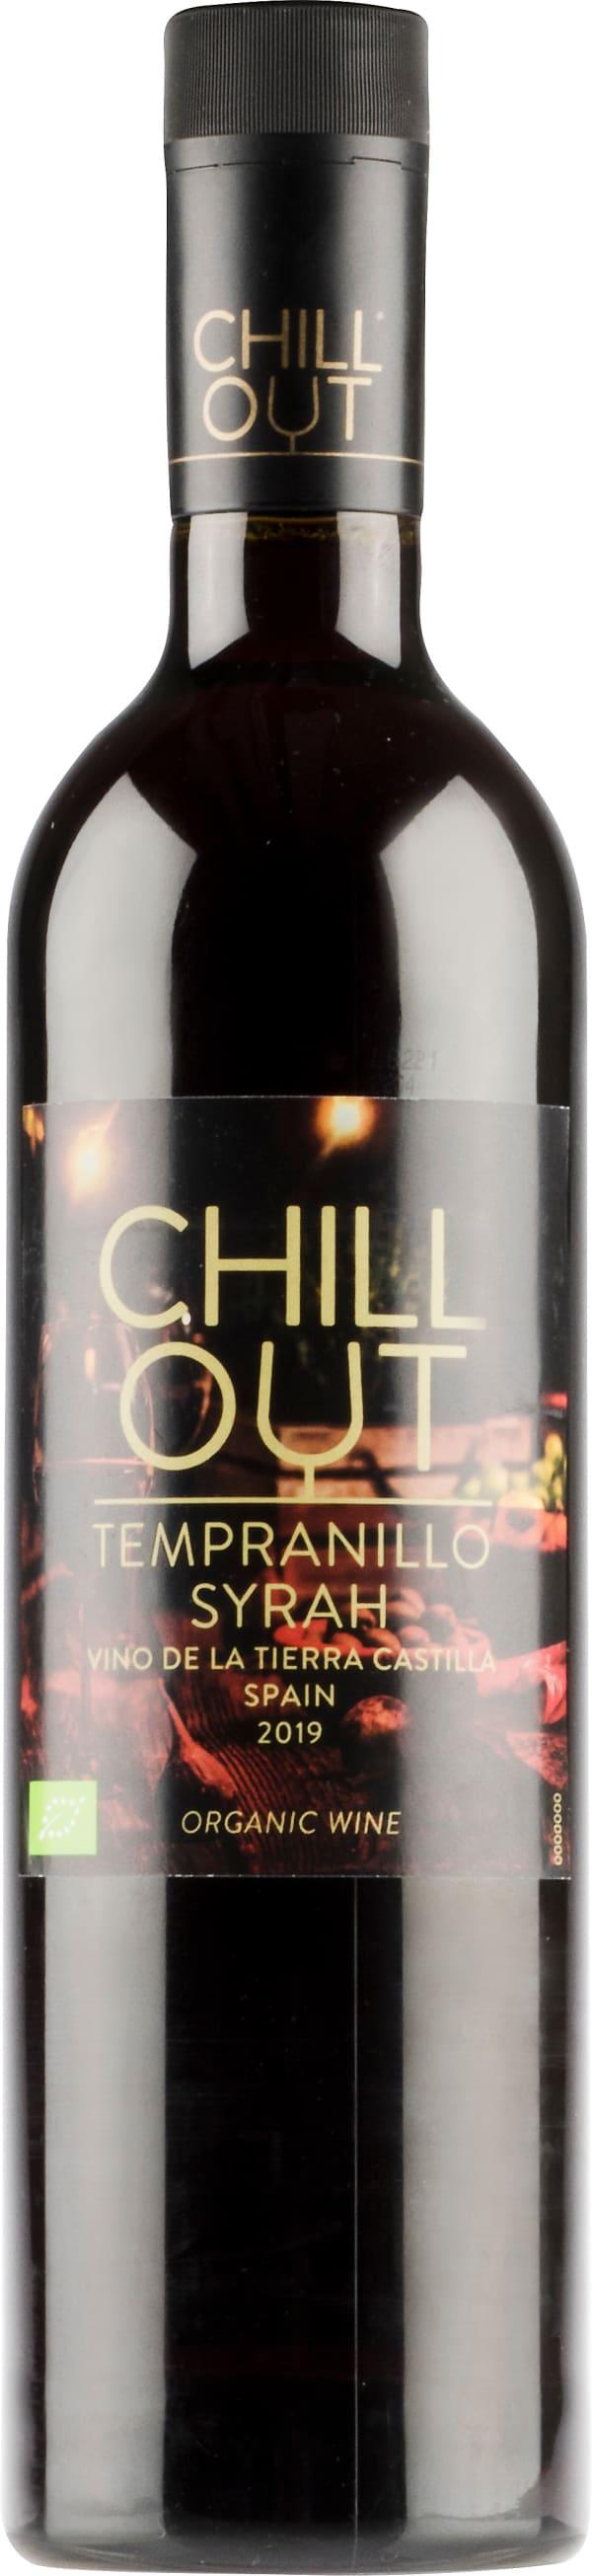 Chill Out Organic Tempranillo Syrah 2019 plastflaska